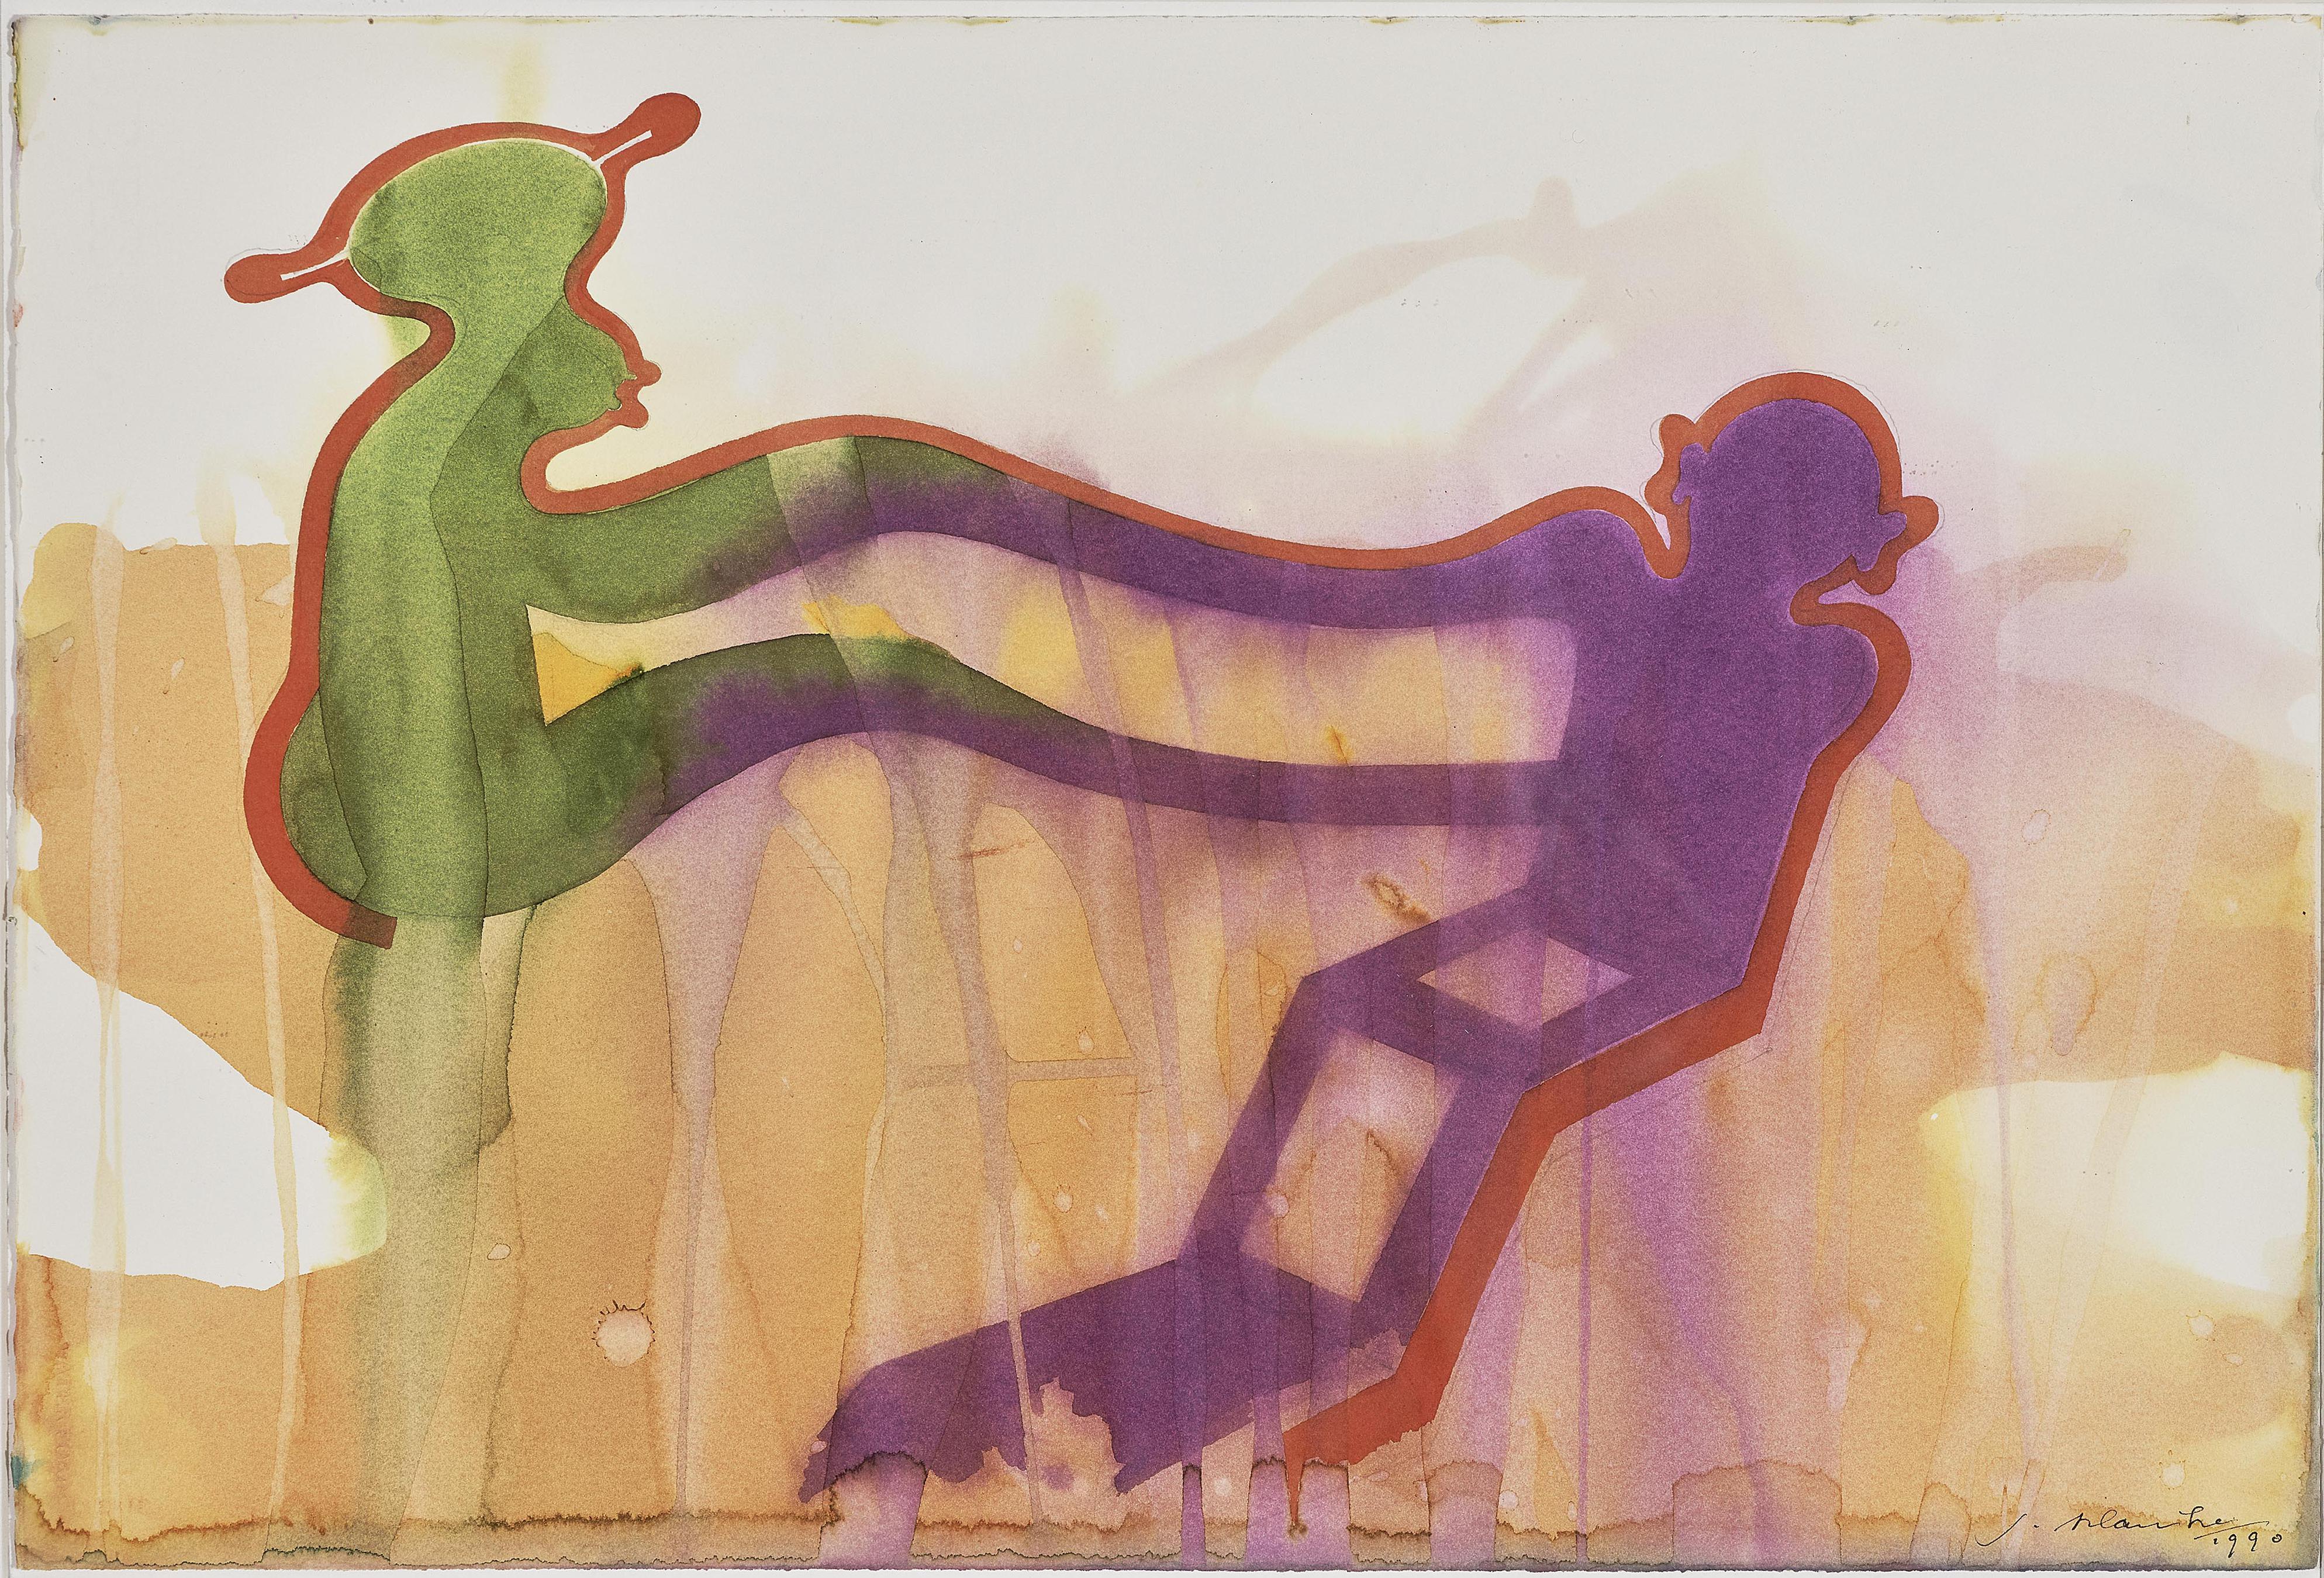 Jurgen Klauke-3 Aquarelle Aus Dem Zyklus Stephen Hero: Zwiegesprach I. Zwiegesprach II. Ohne Titel (3 watercolours from the Stephan Heros cycle: Dialogue I - Dialogue II - Untitled)-1990